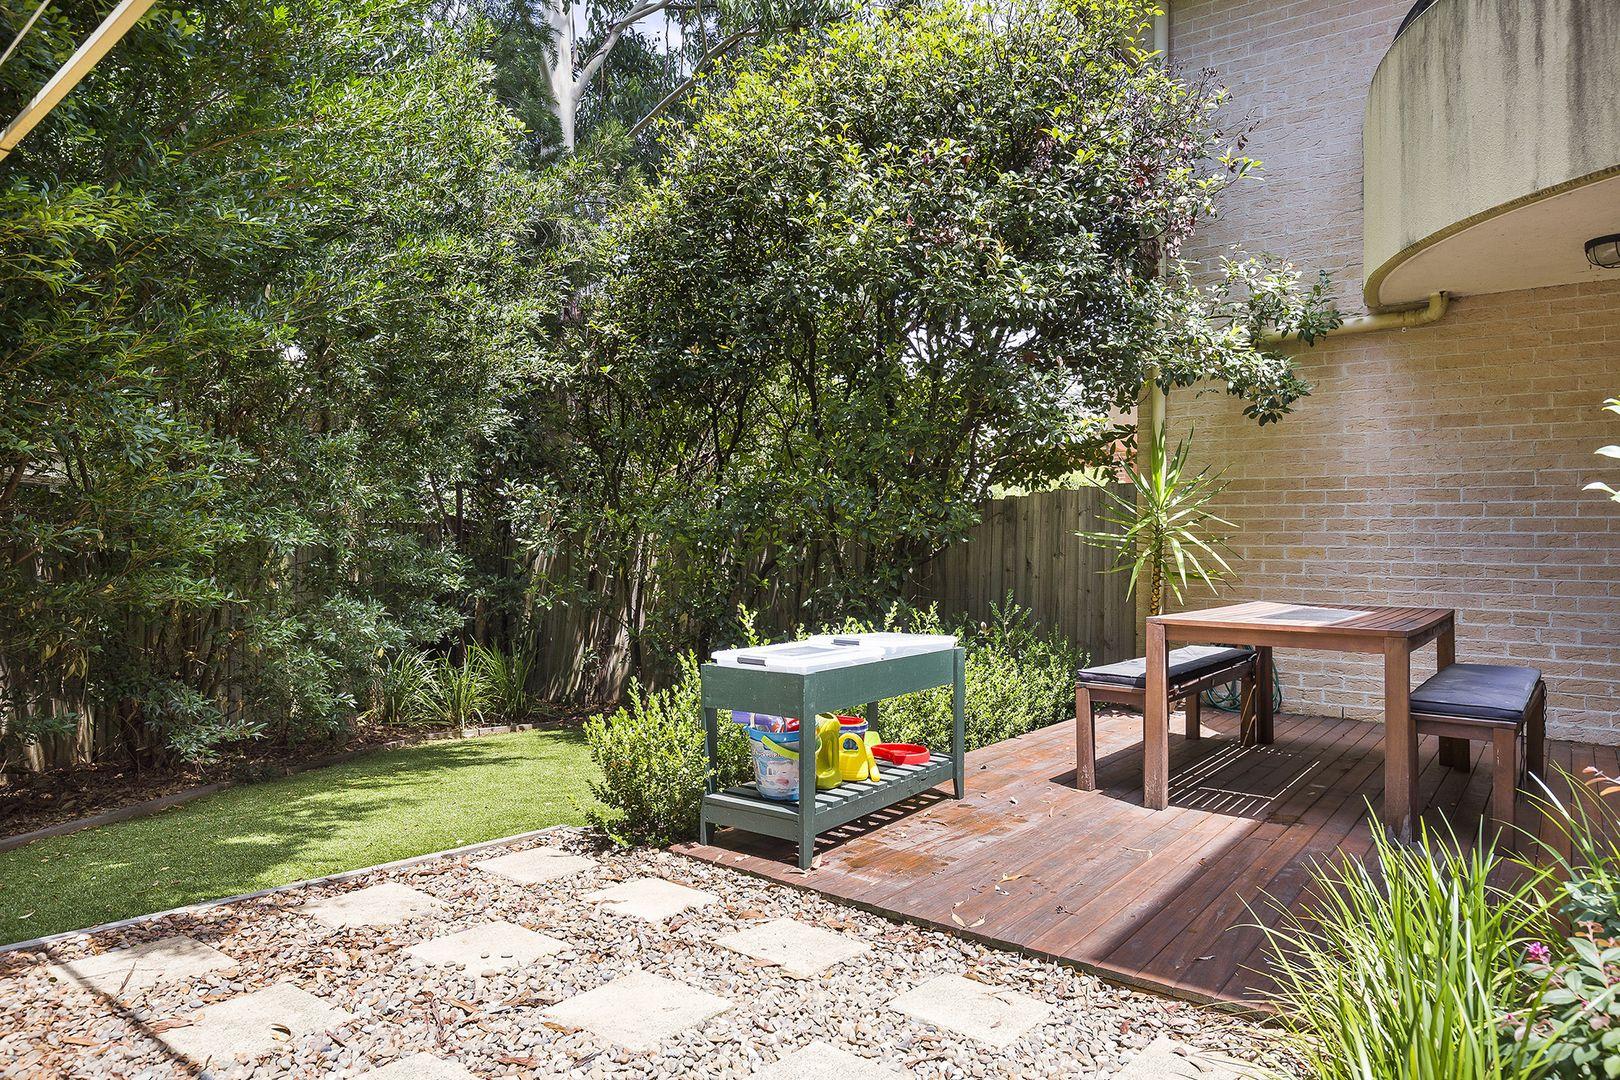 31/32-38 Dobson Crescent a.k.a 31/78-82 Old Northern Road, Baulkham Hills NSW 2153, Image 2